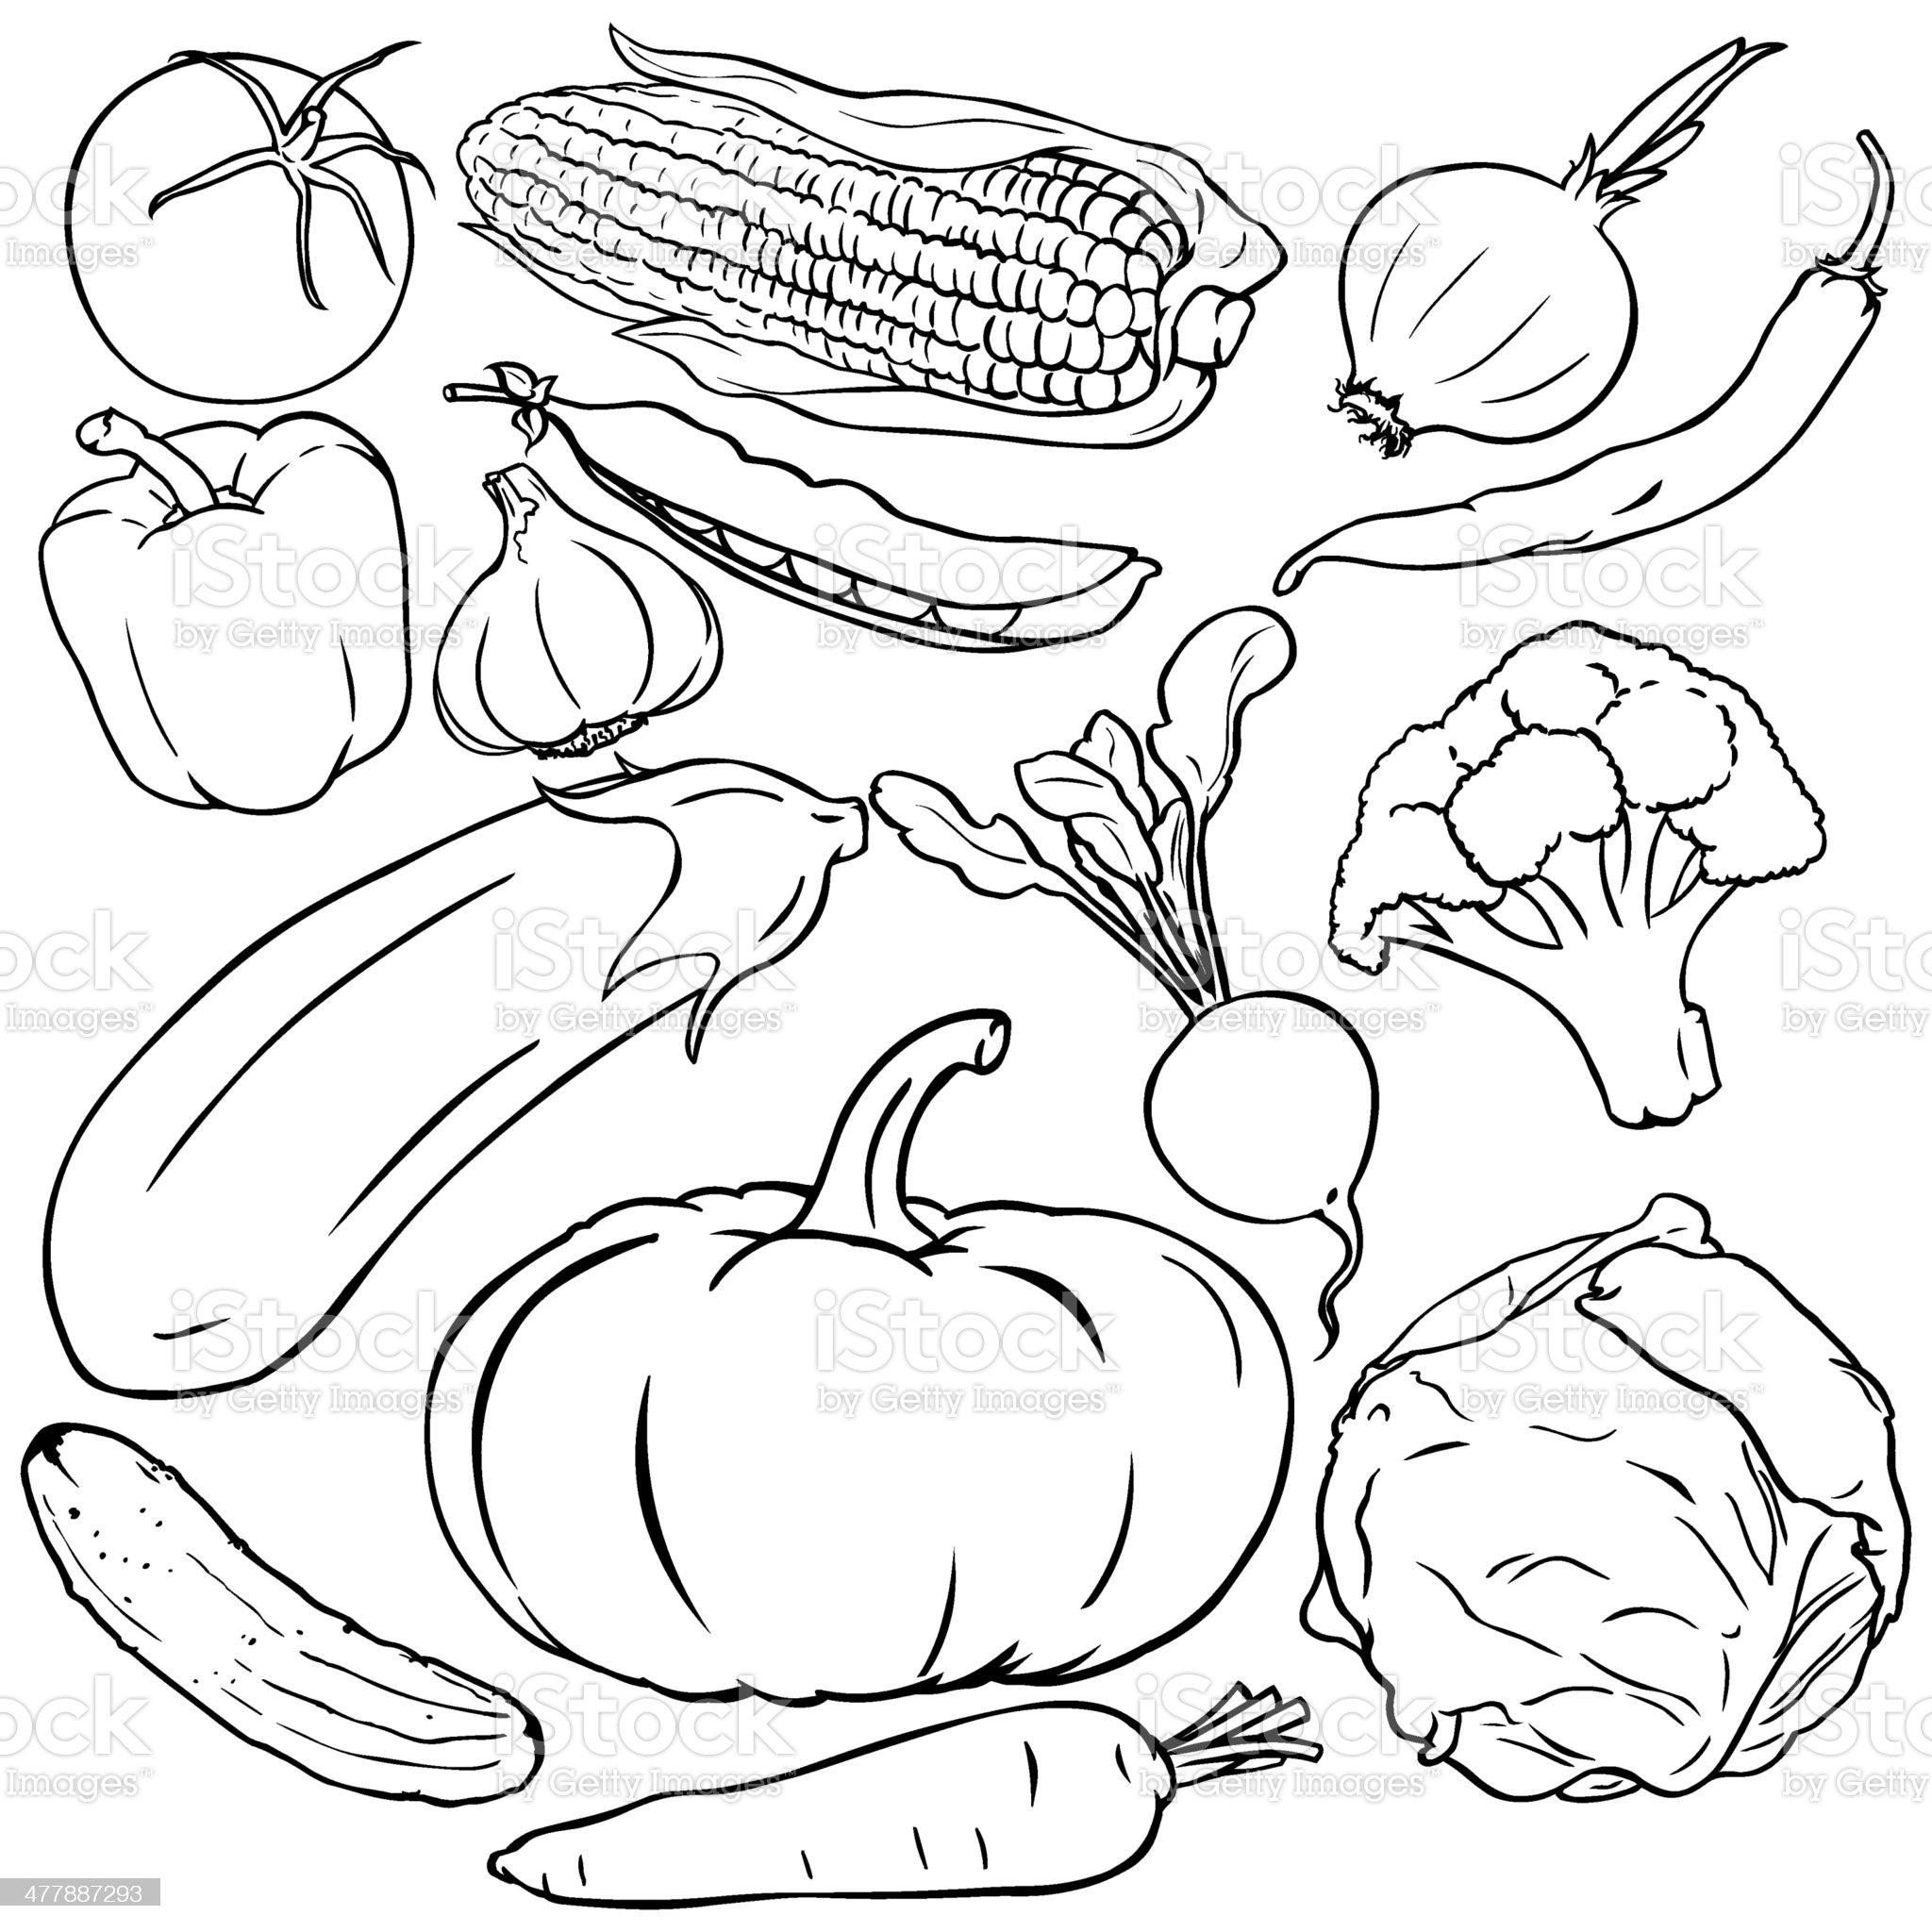 Vector set of vegetables royalty-free stock vector art